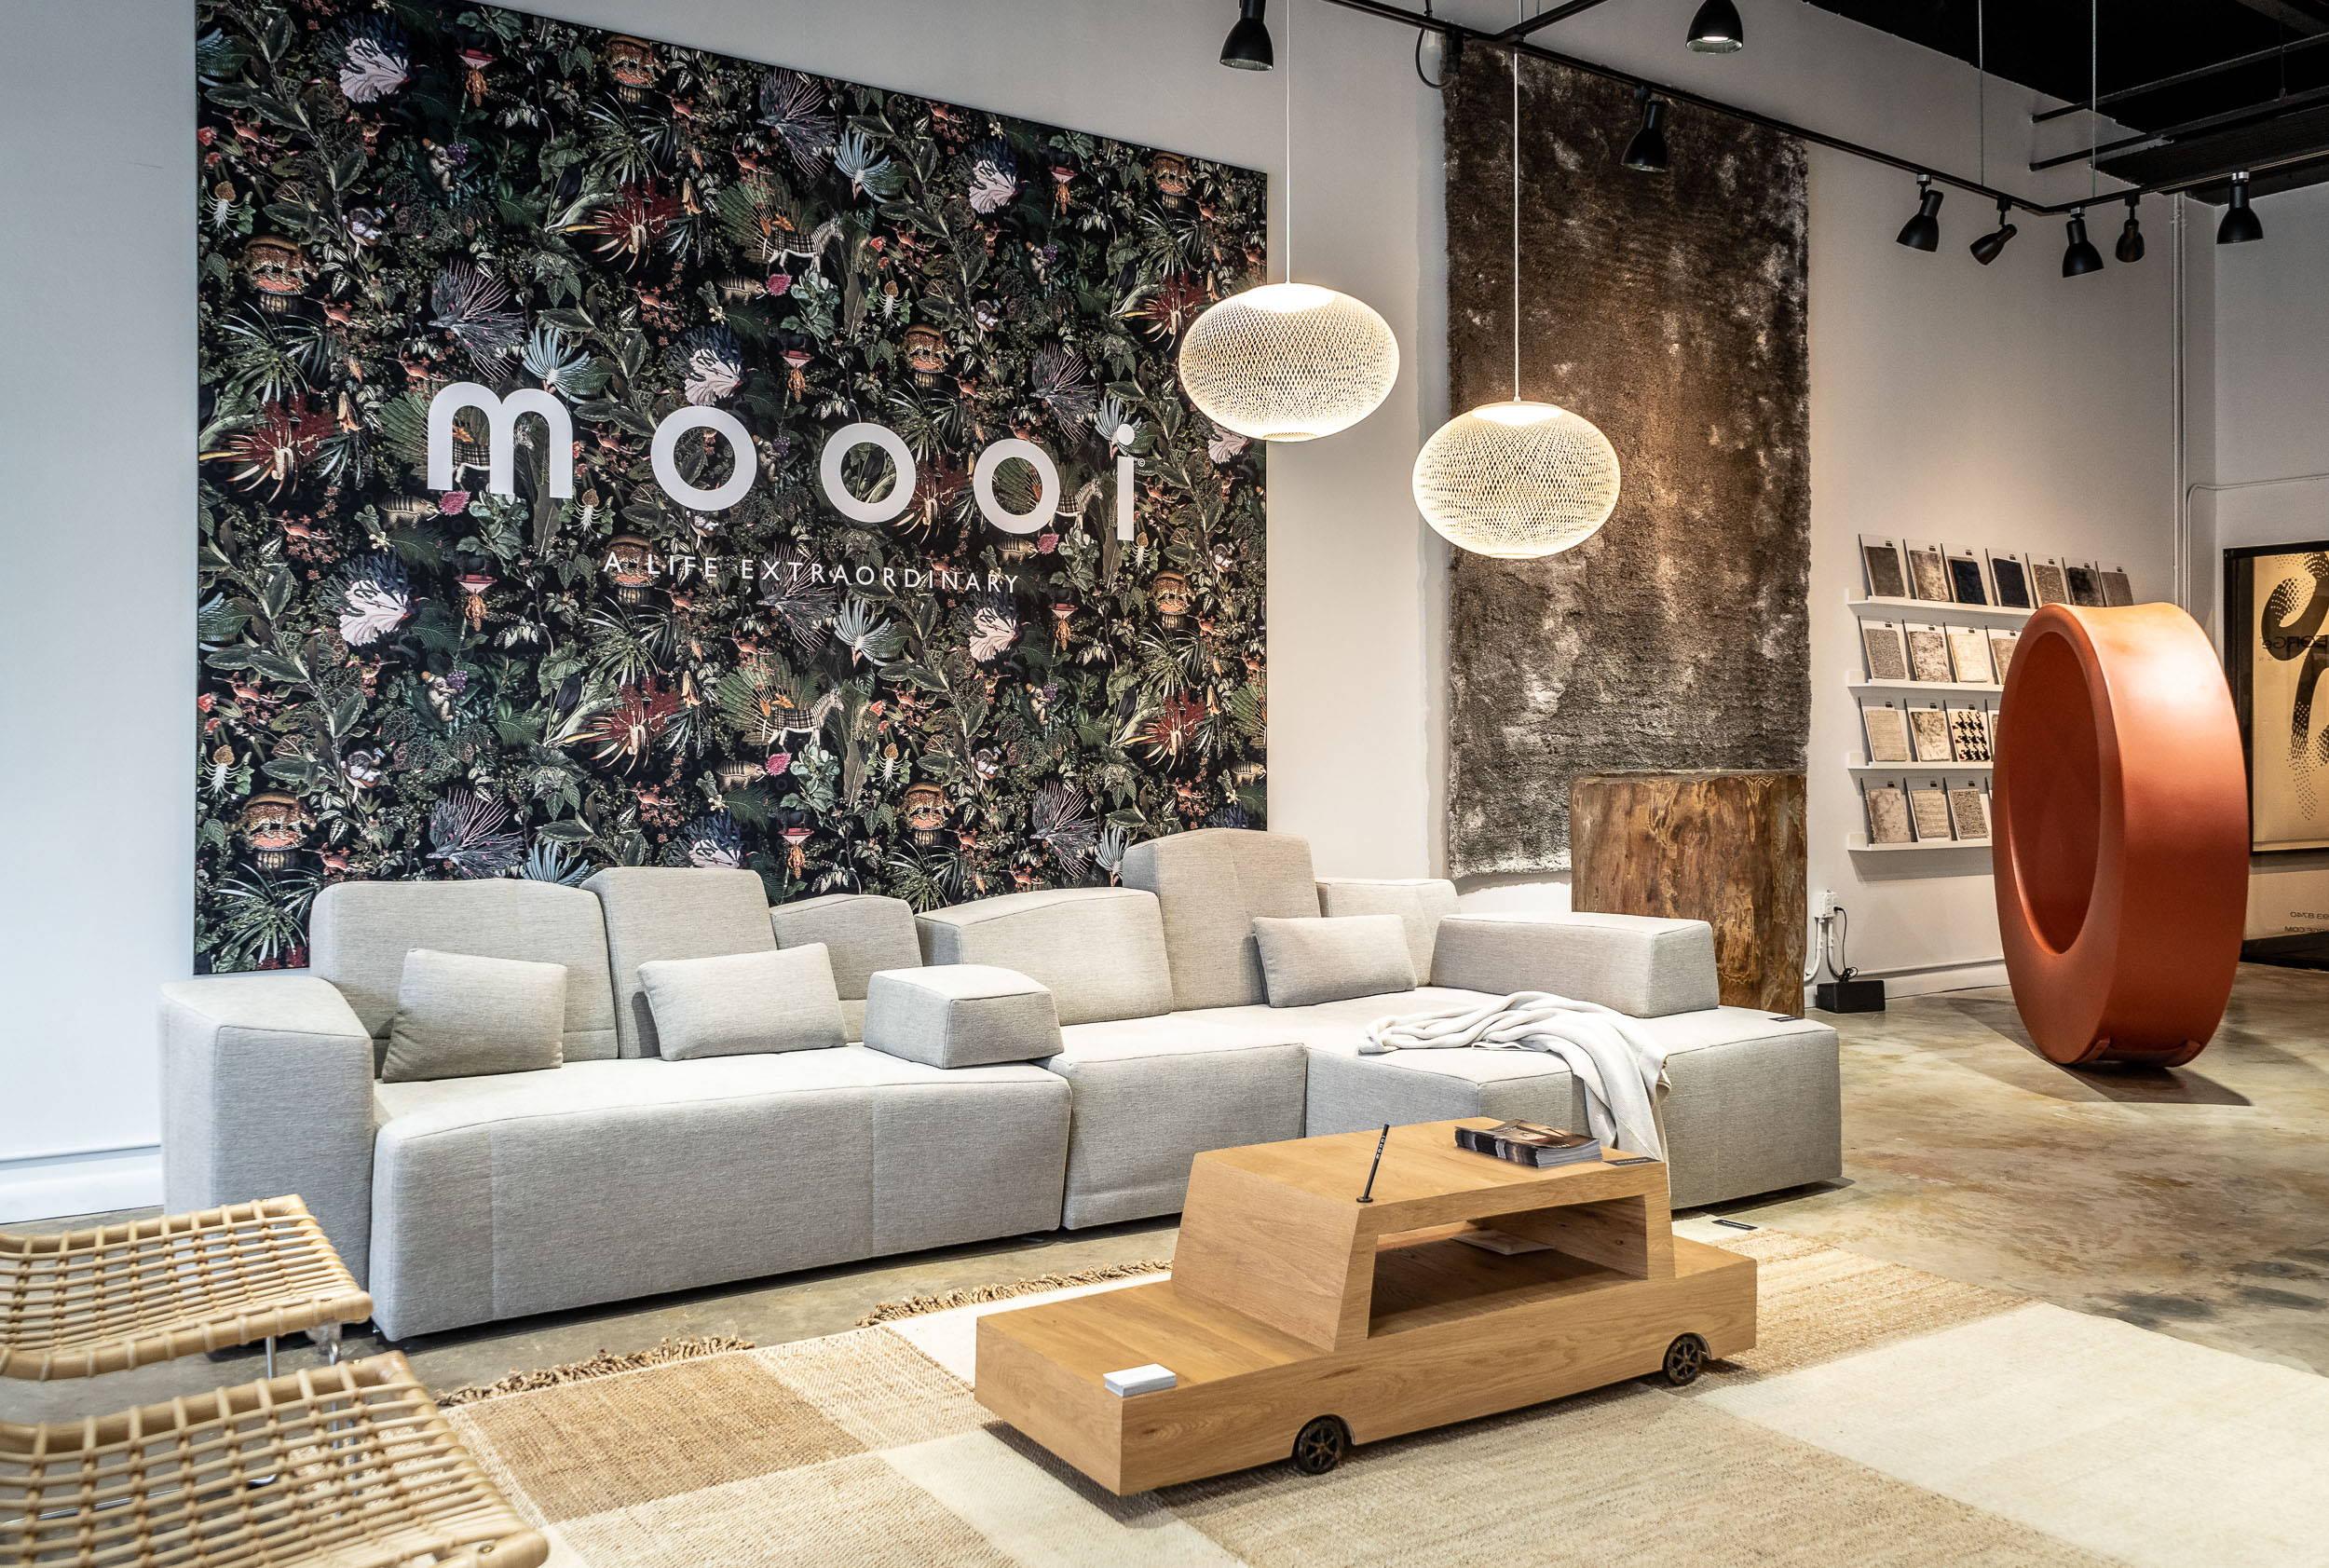 JANGEORGe Interior Design, Miami Showroom with MOOOI, GT Design on display.